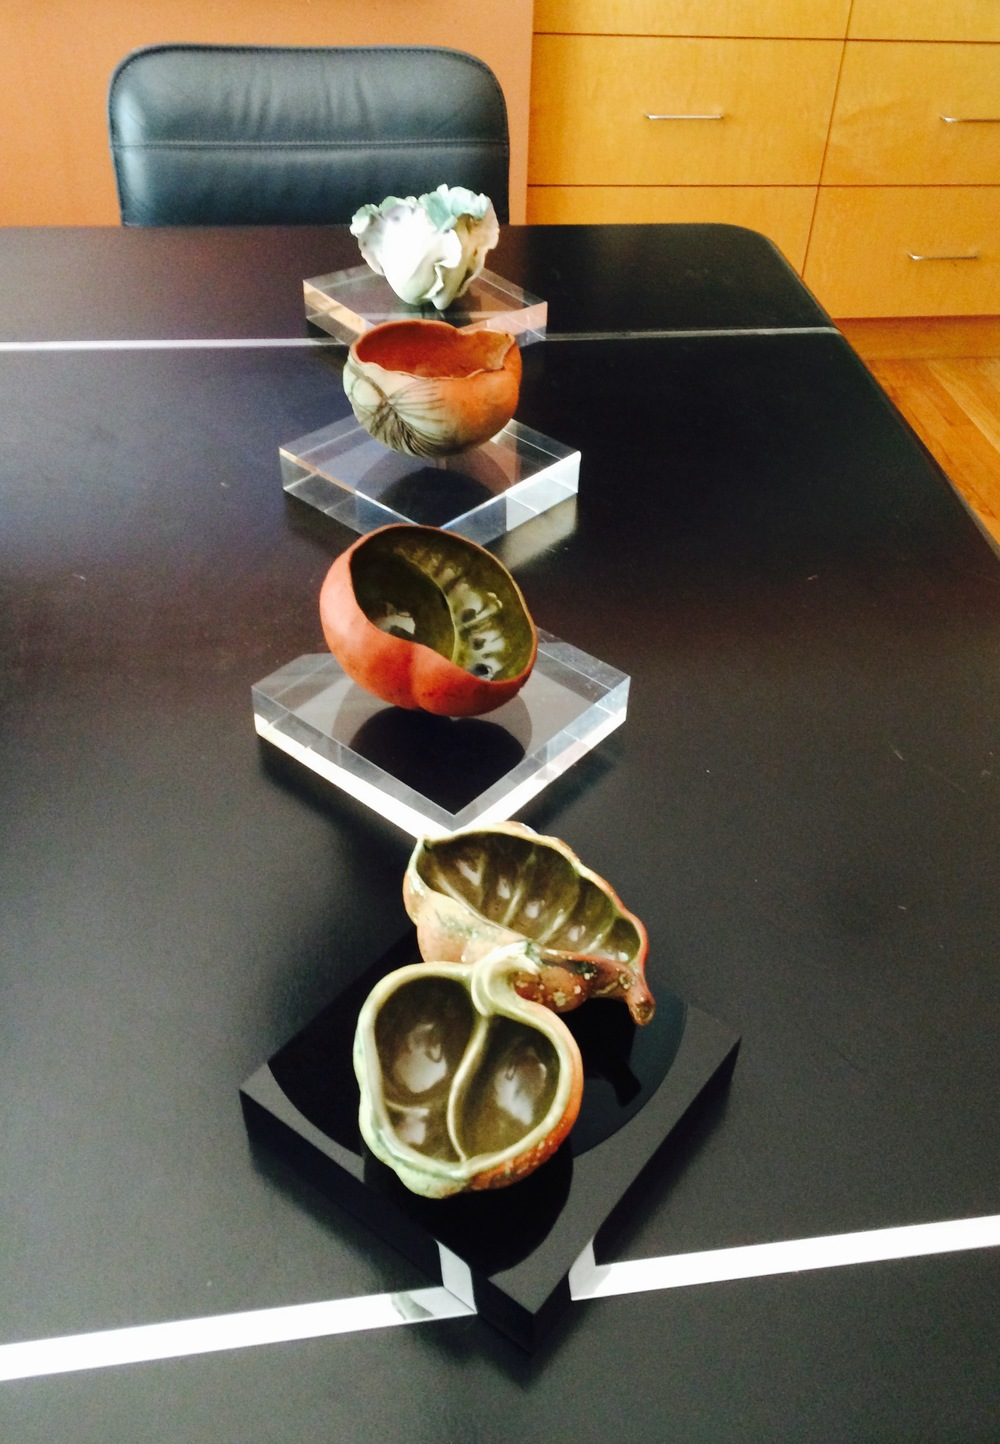 https://alice-ballard.squarespace.com/config#/pages/551ae4efe4b0453e4dfd7b9b /meditation-bowls-1